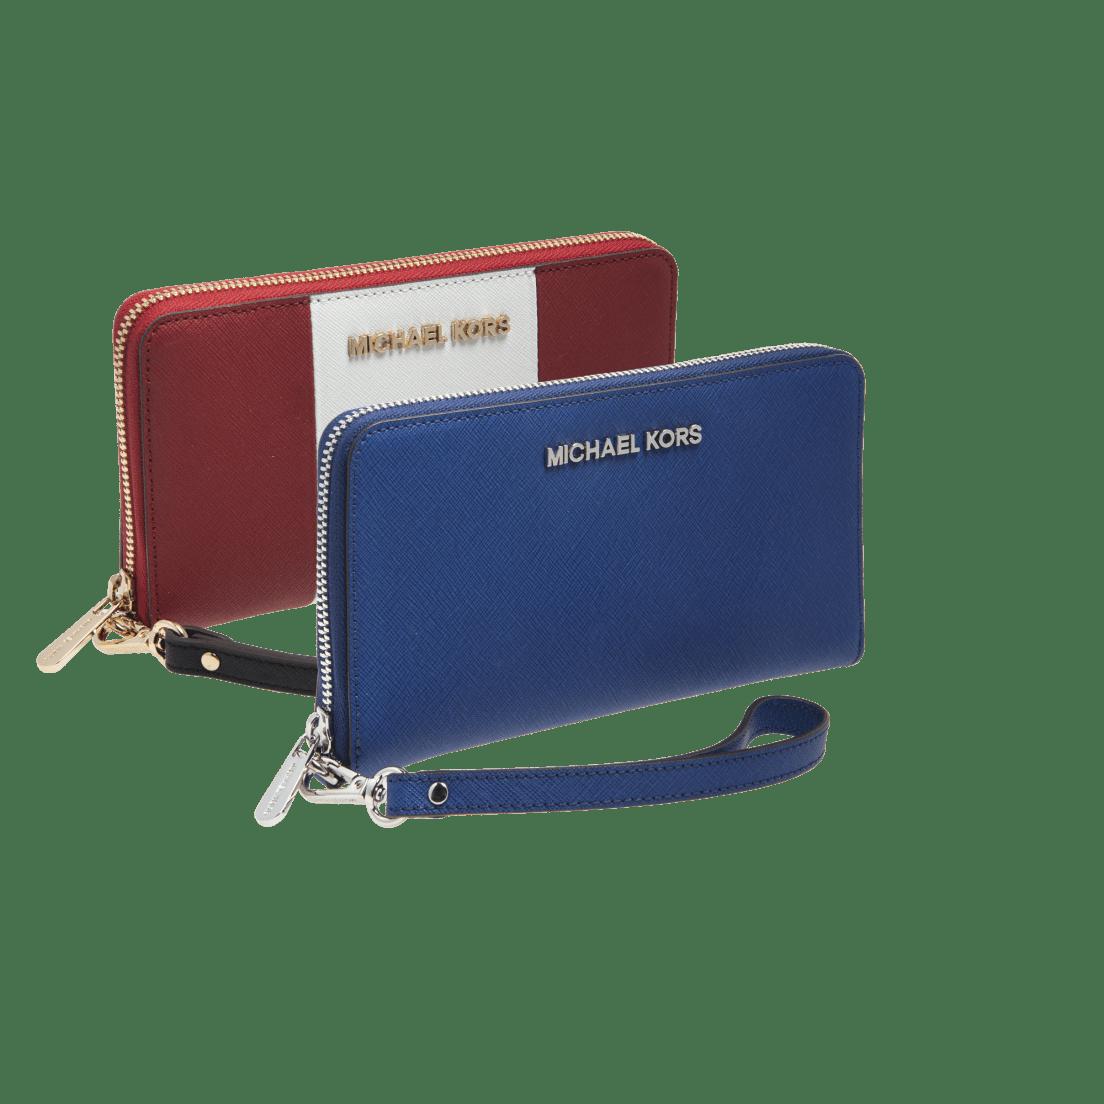 dffa7036bfcf Large Essential Zip Wallet by Michael Kors